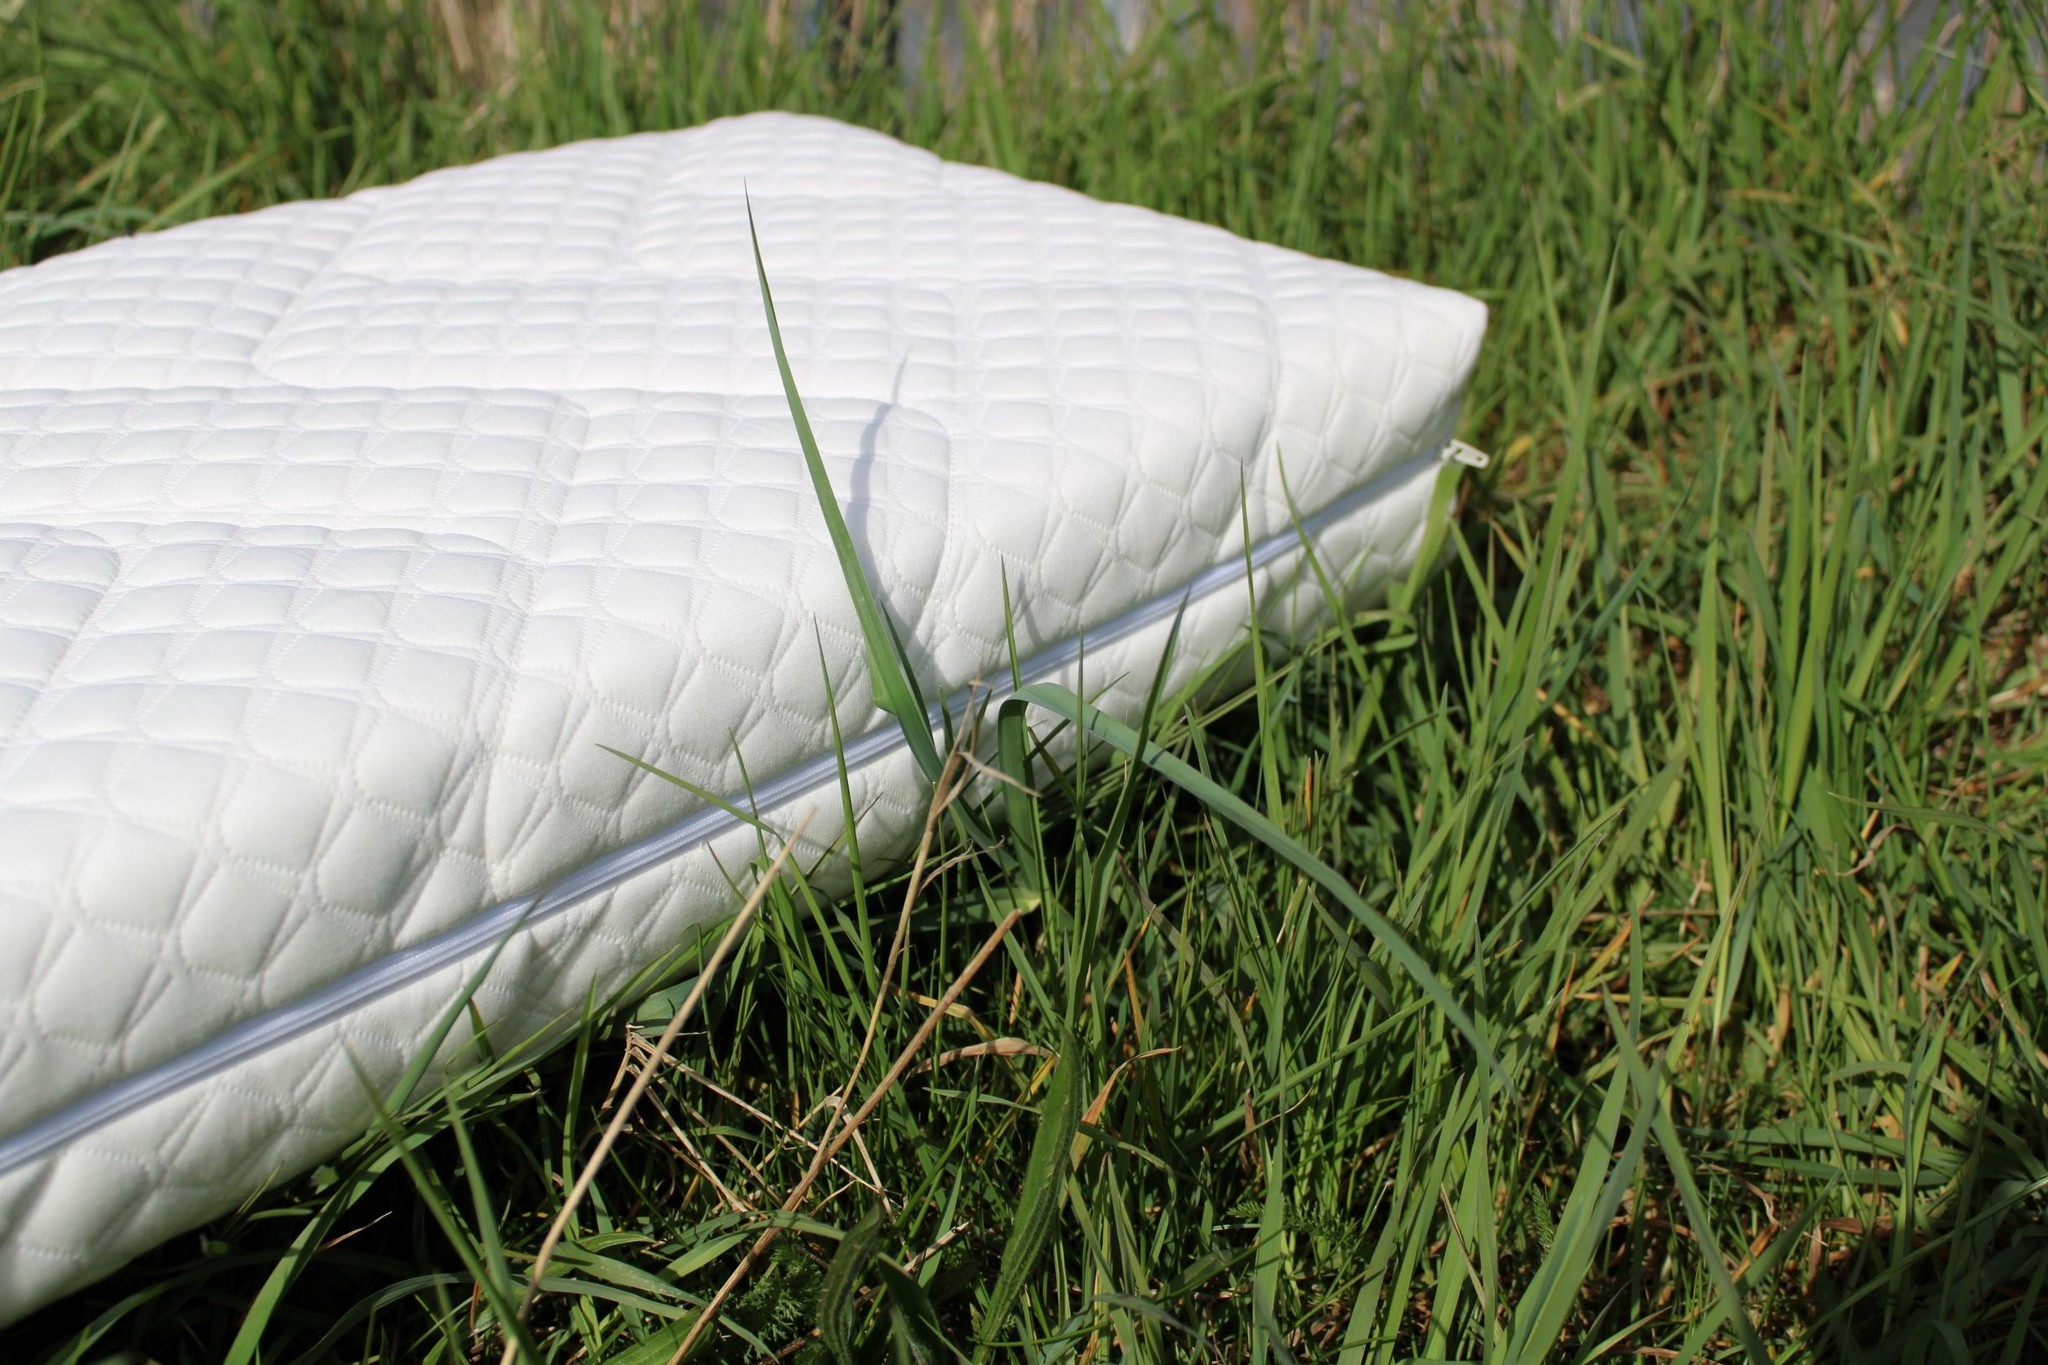 Sarpy Kindermatras 90x195 Sertel Tailor Made Mattress